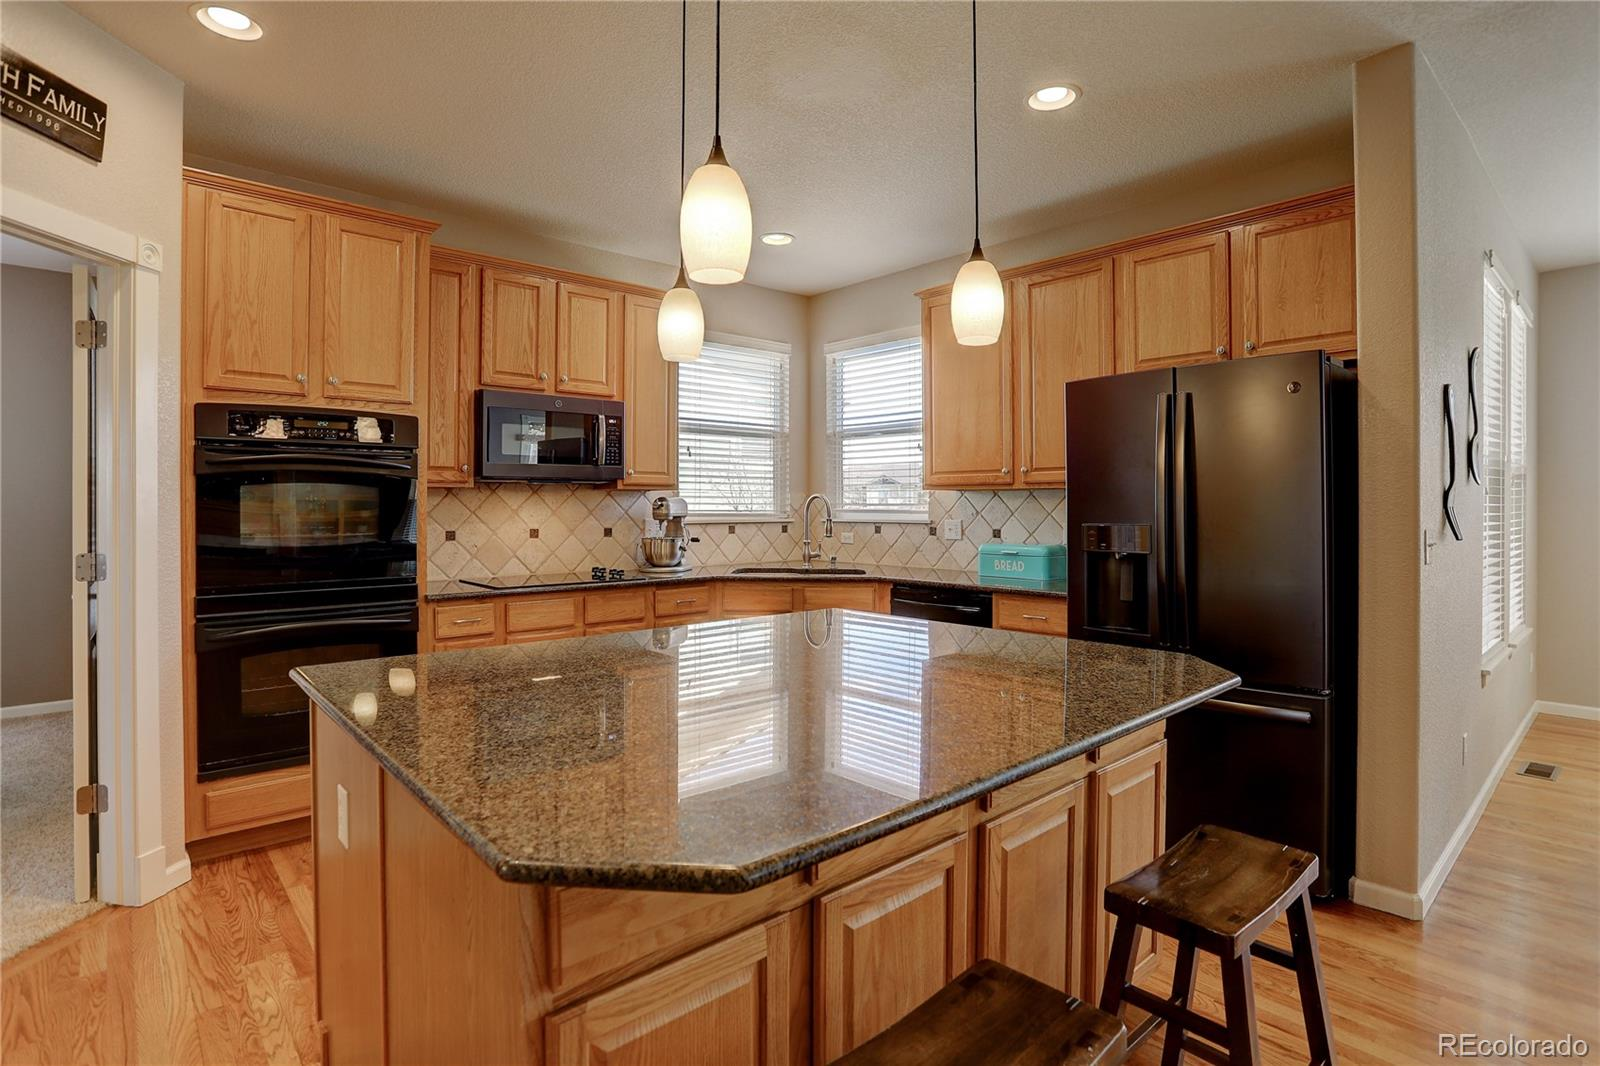 MLS# 3656997 - 4 - 10670 Addison Court, Highlands Ranch, CO 80126